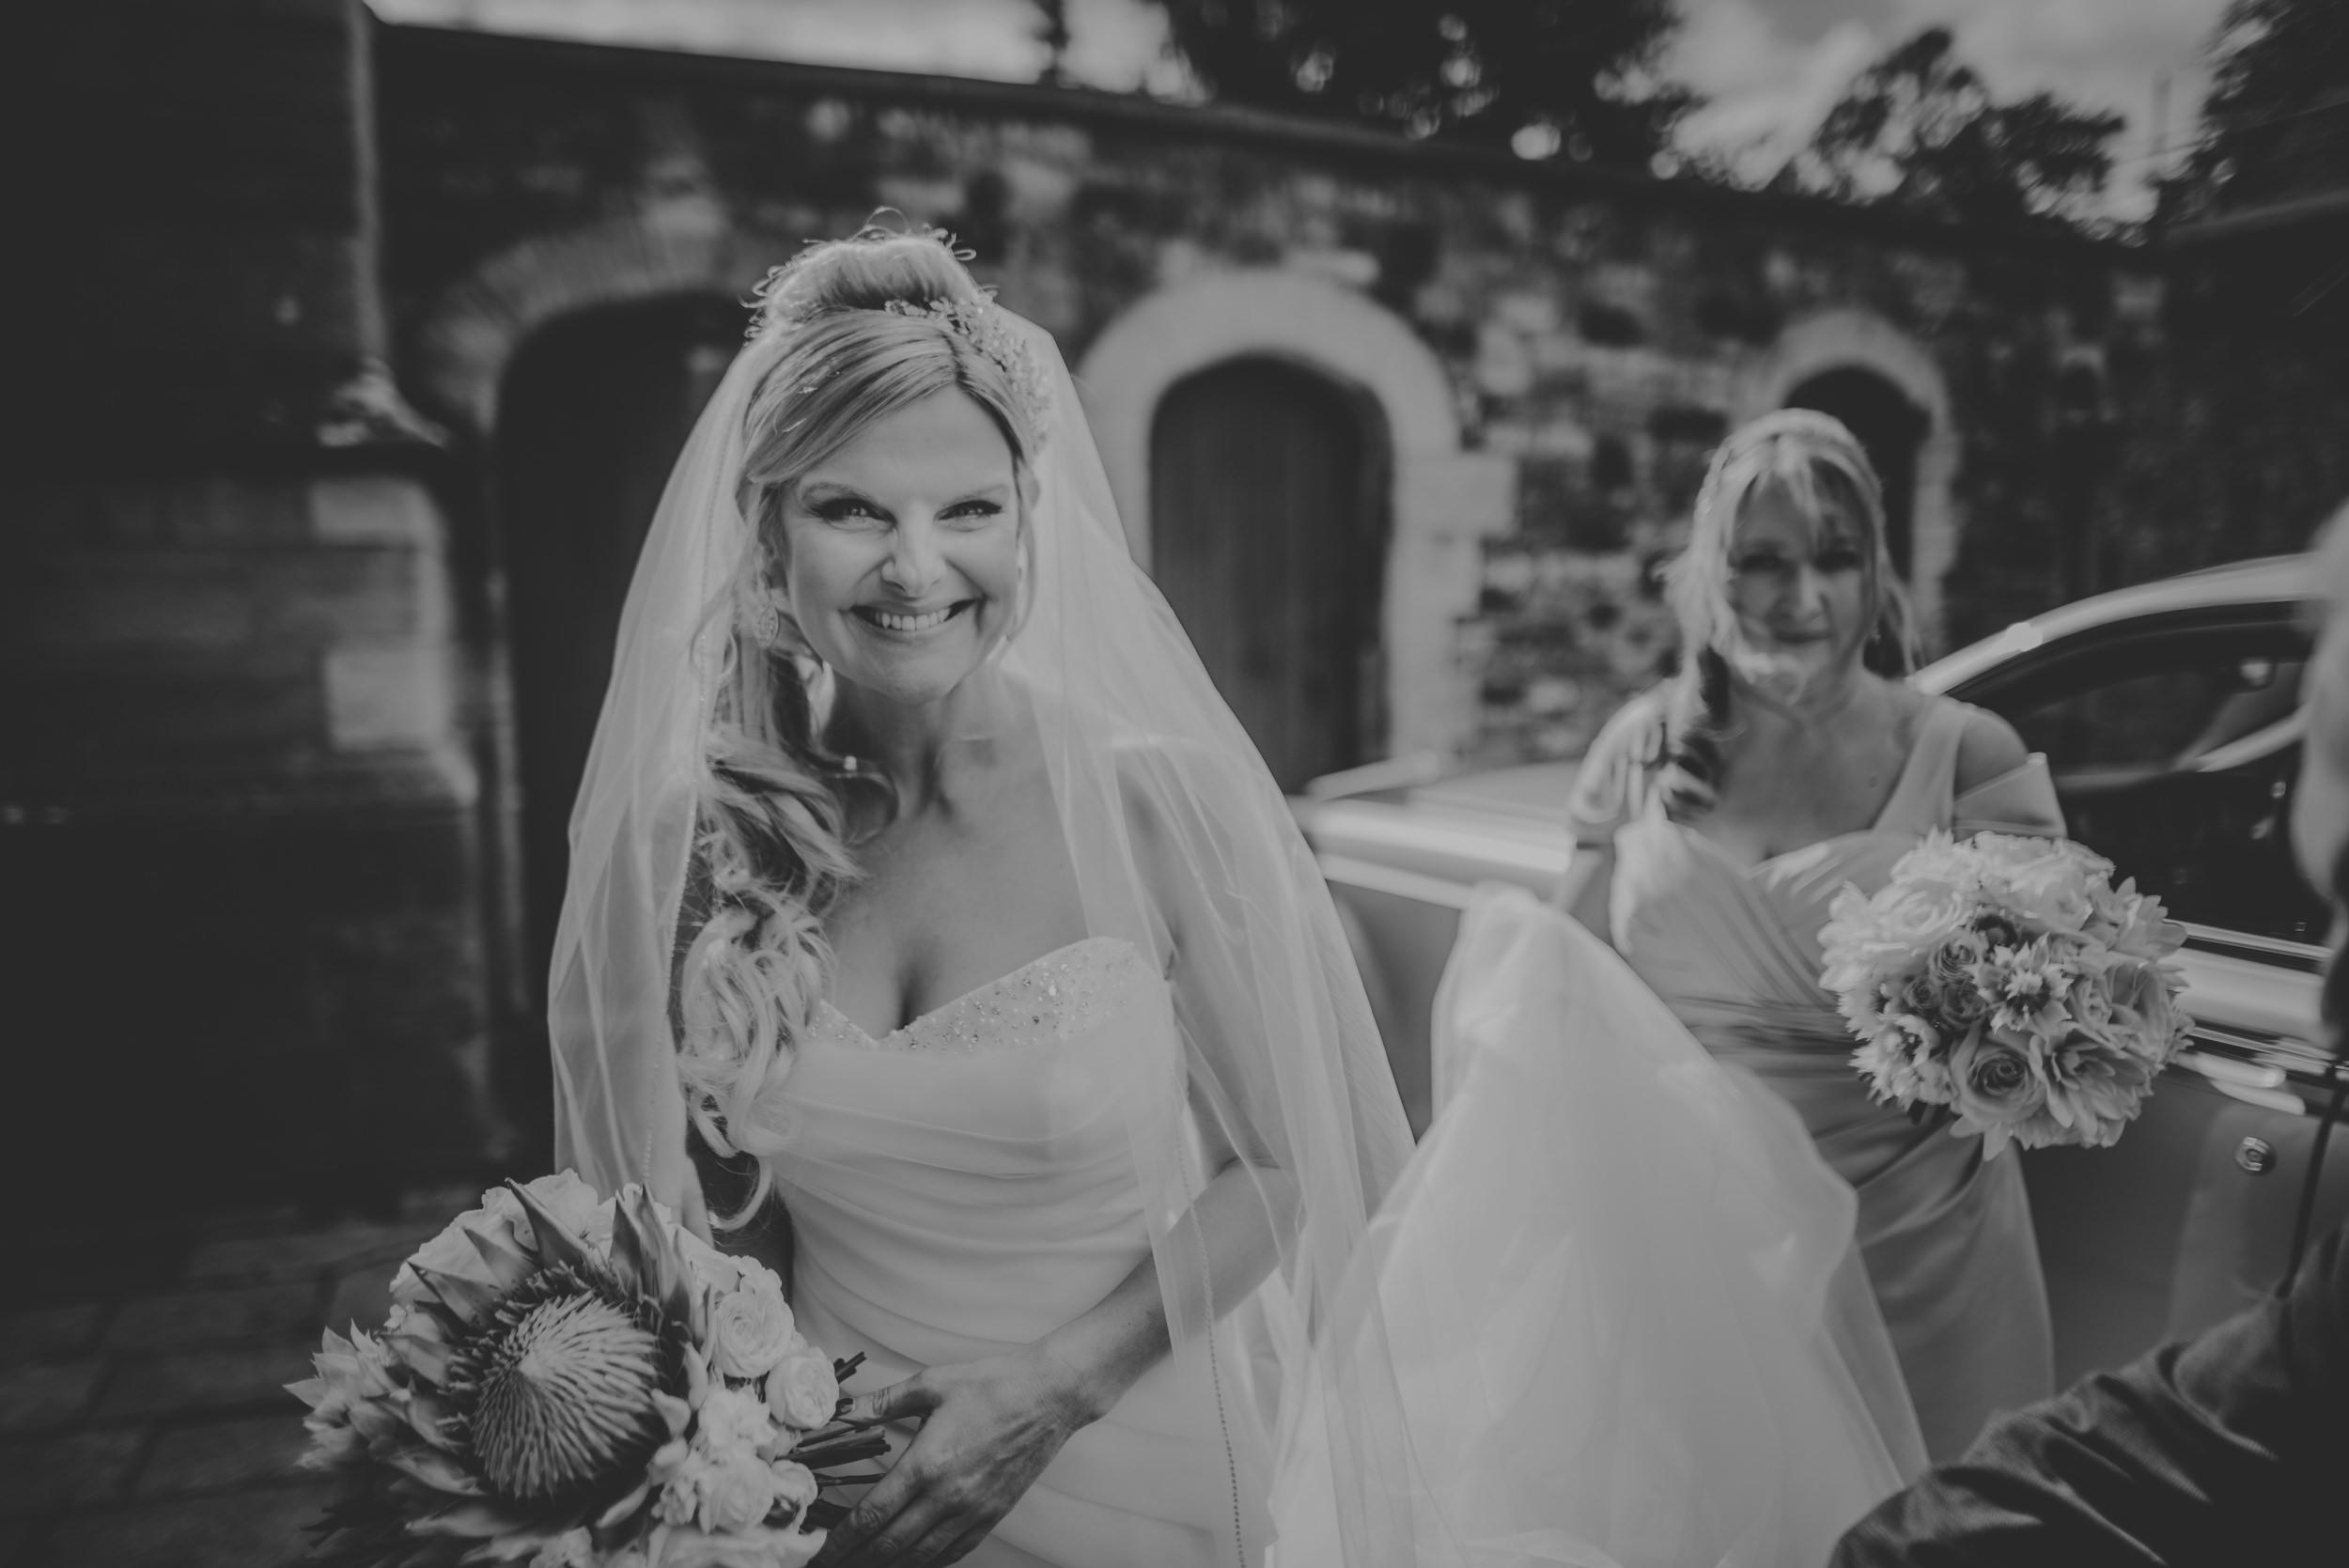 Trisha-and-Roger-wedding-The-Priory-Church-and-Chewton-Glen-Hotel-Christchurch-Manu-Mendoza-Wedding-Photography-107.jpg